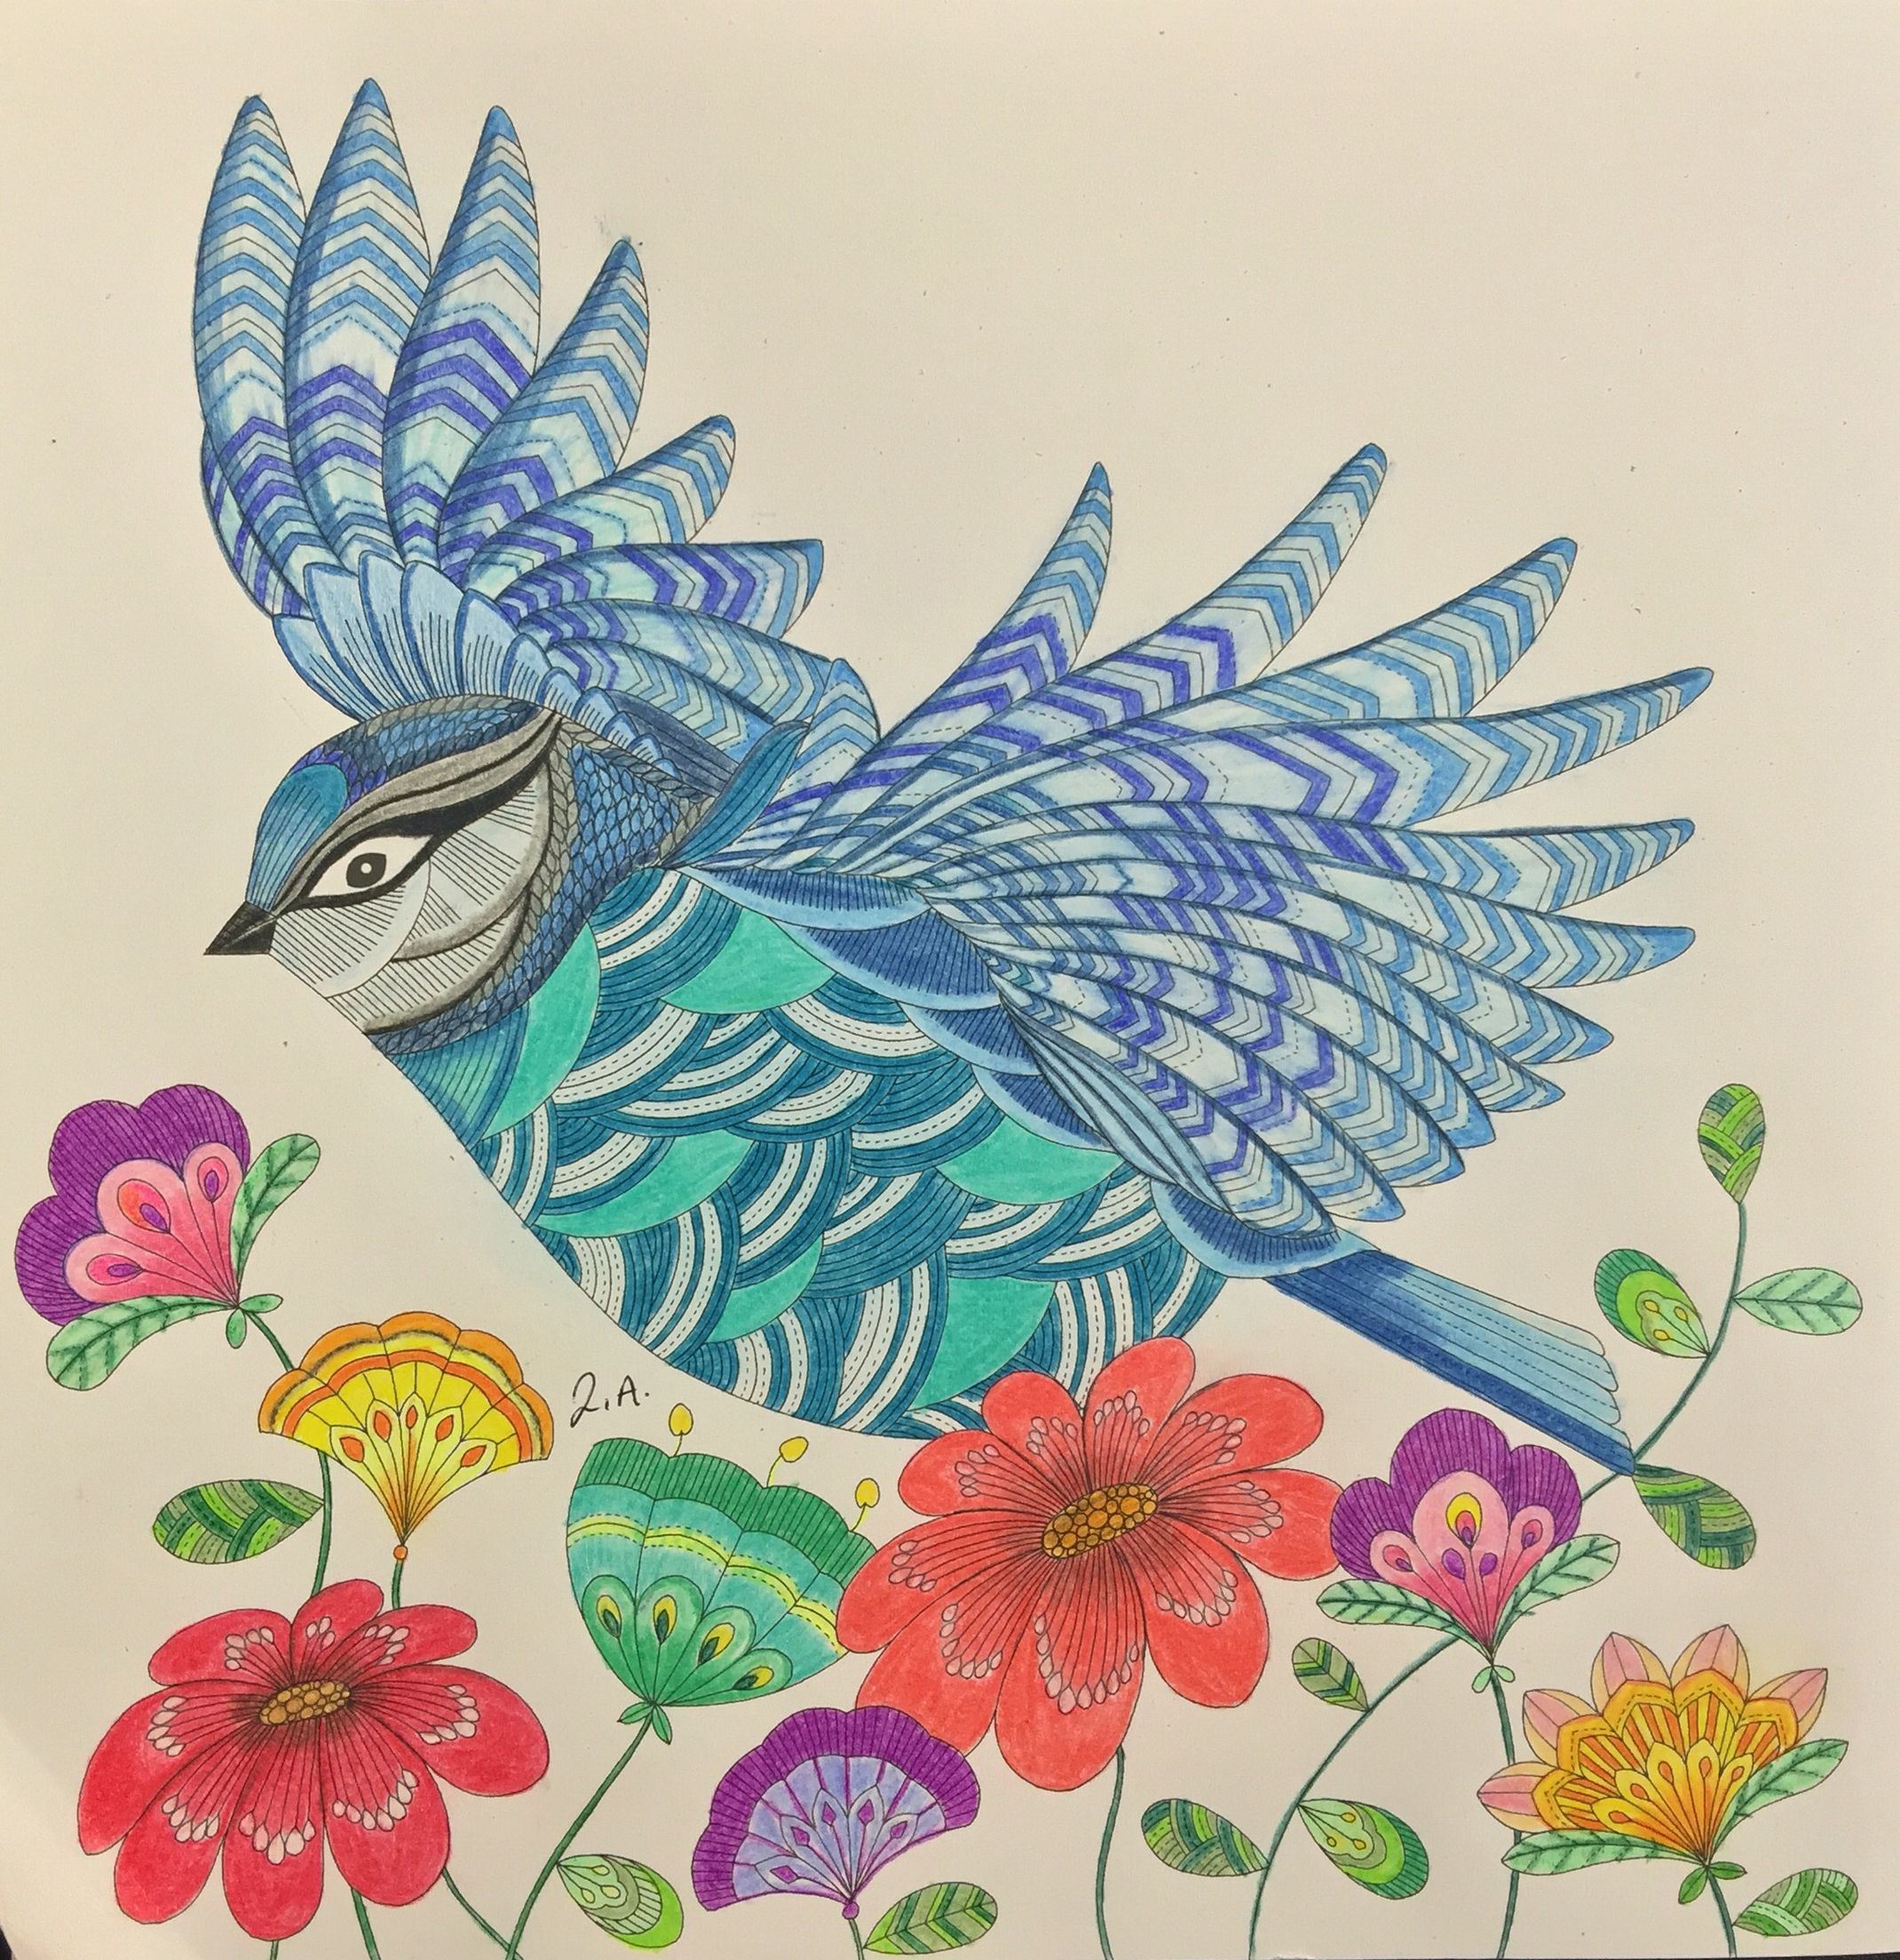 Bird Flowers Animal Kingdom Millie Marotta Birds Color Me Draw Me Art Millie Marotta Animals